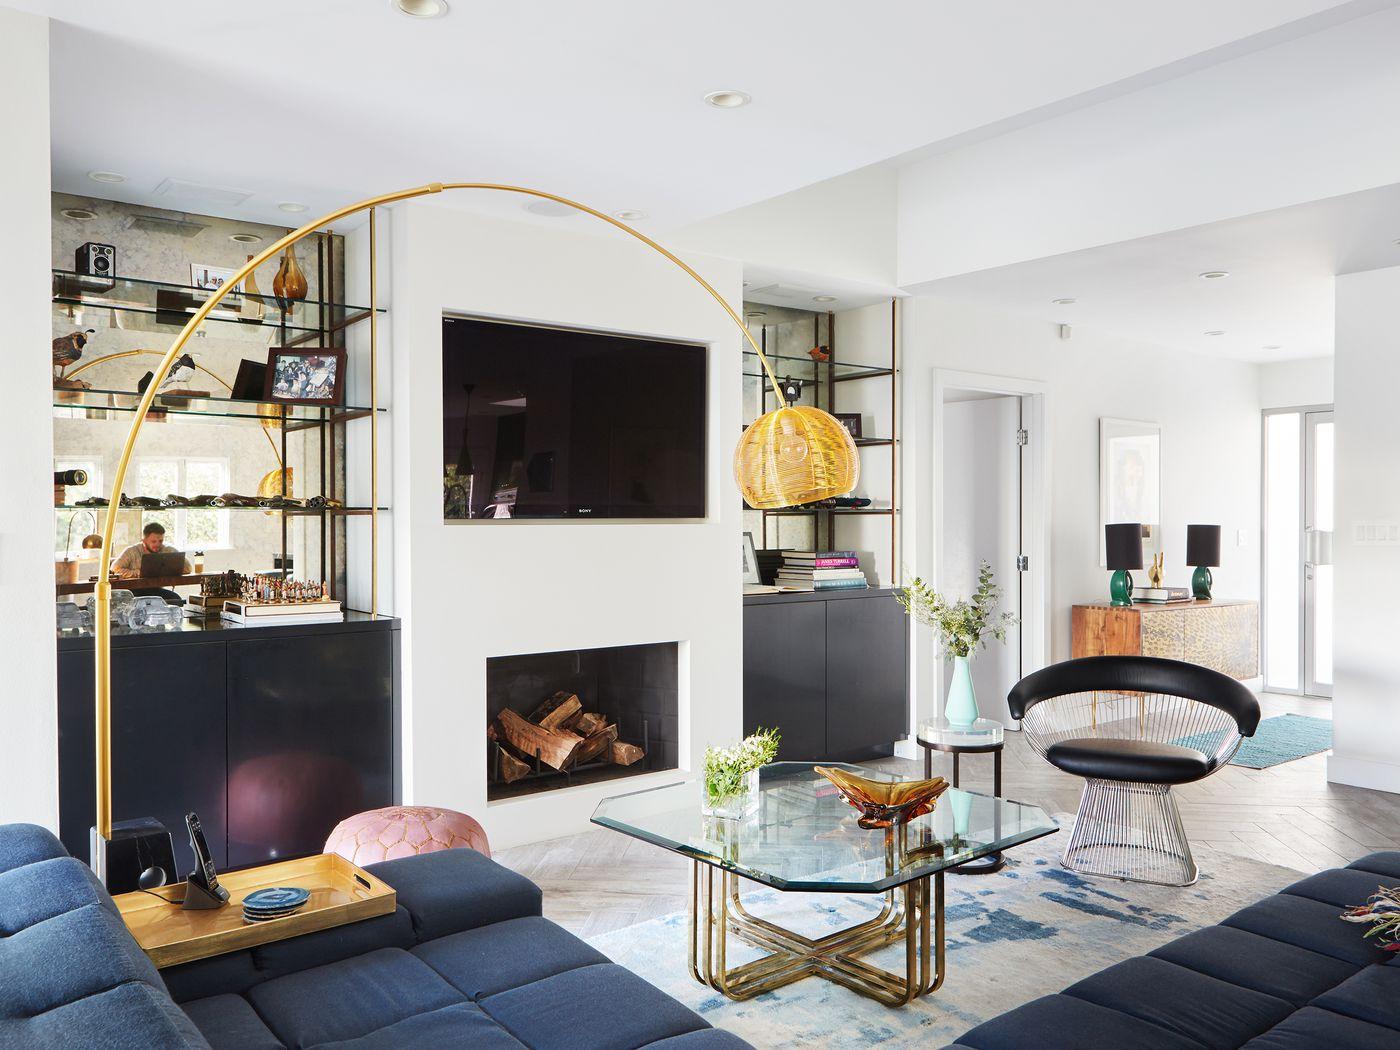 Home Design Cheats Free Gems 100 Home Design Tool Free Myfavoriteheadache